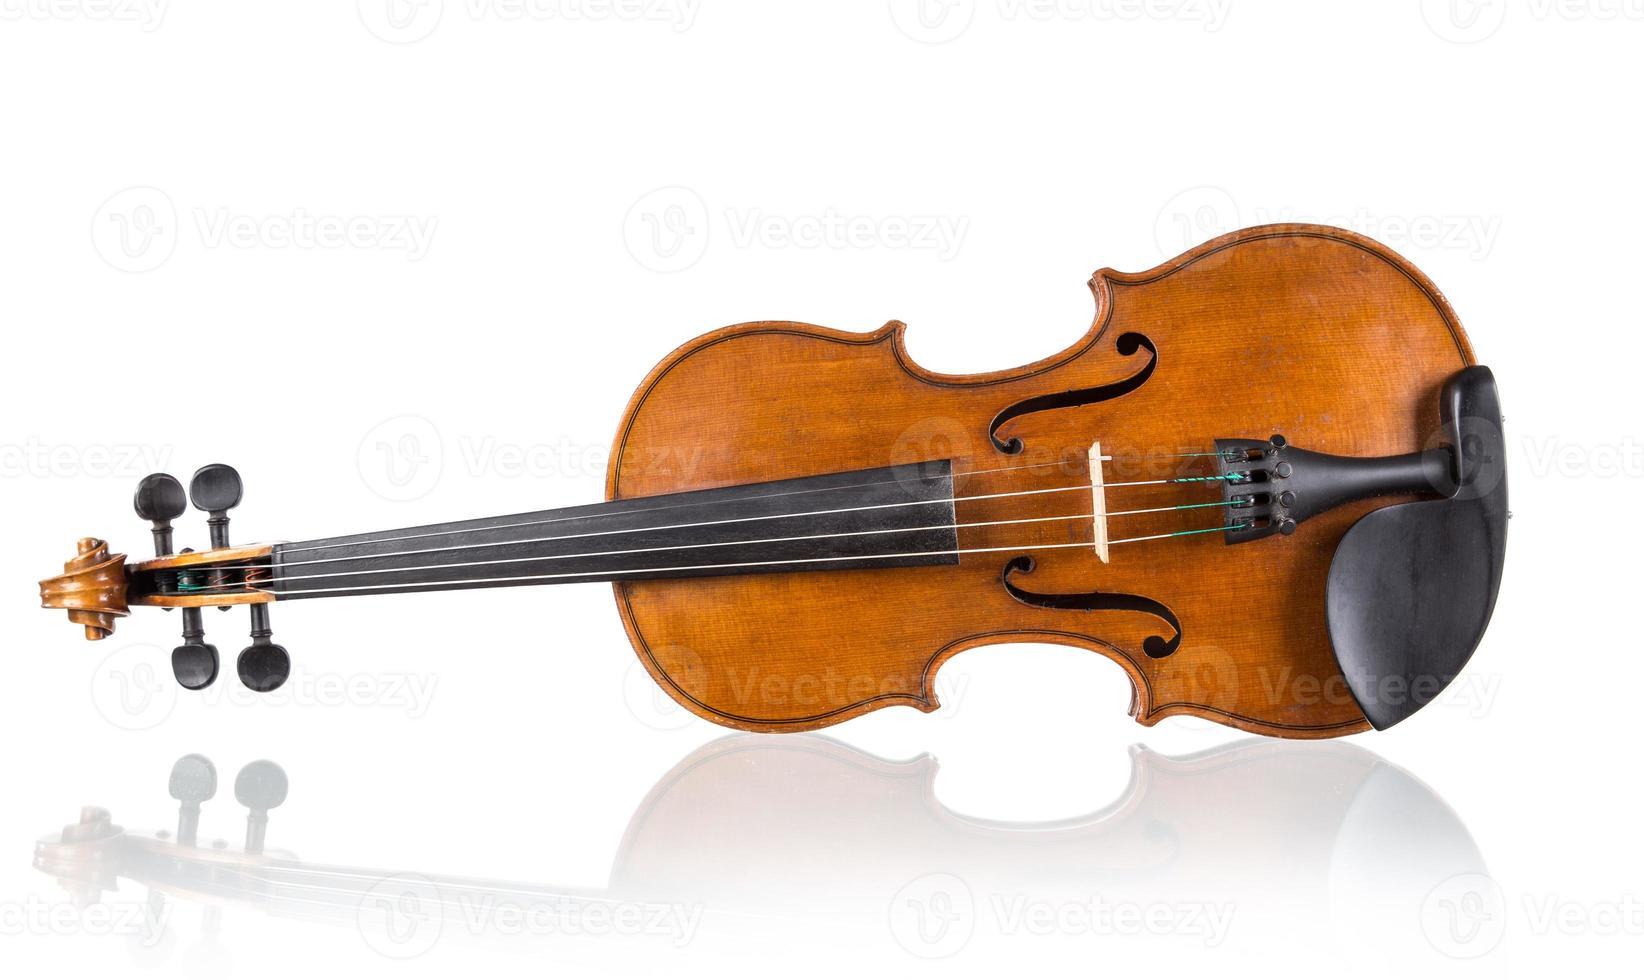 violin in vintage style photo